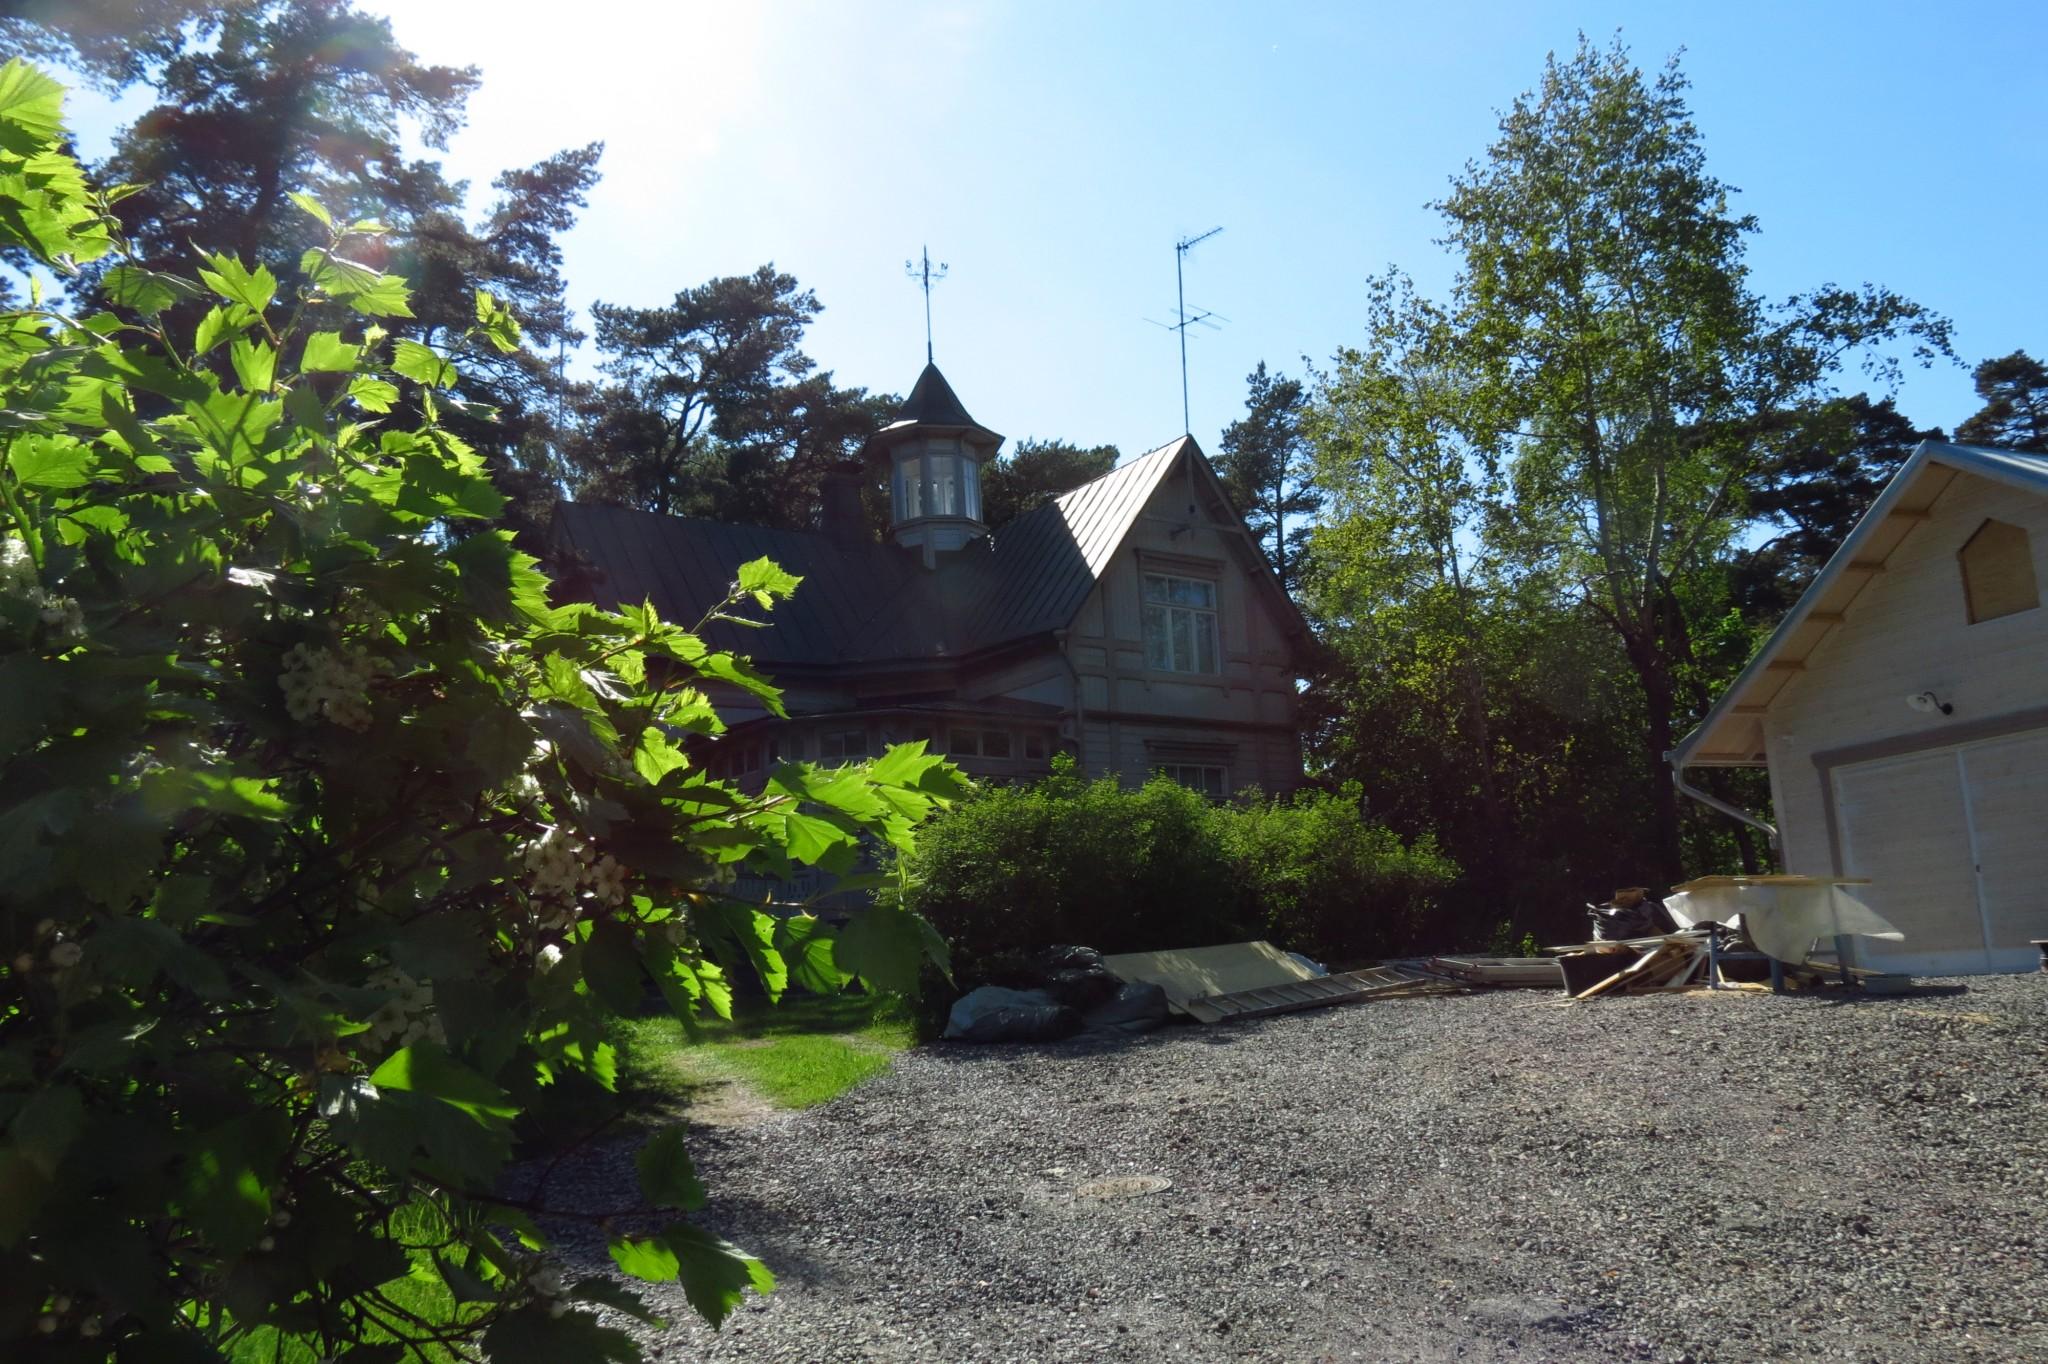 Villa Bergenheim